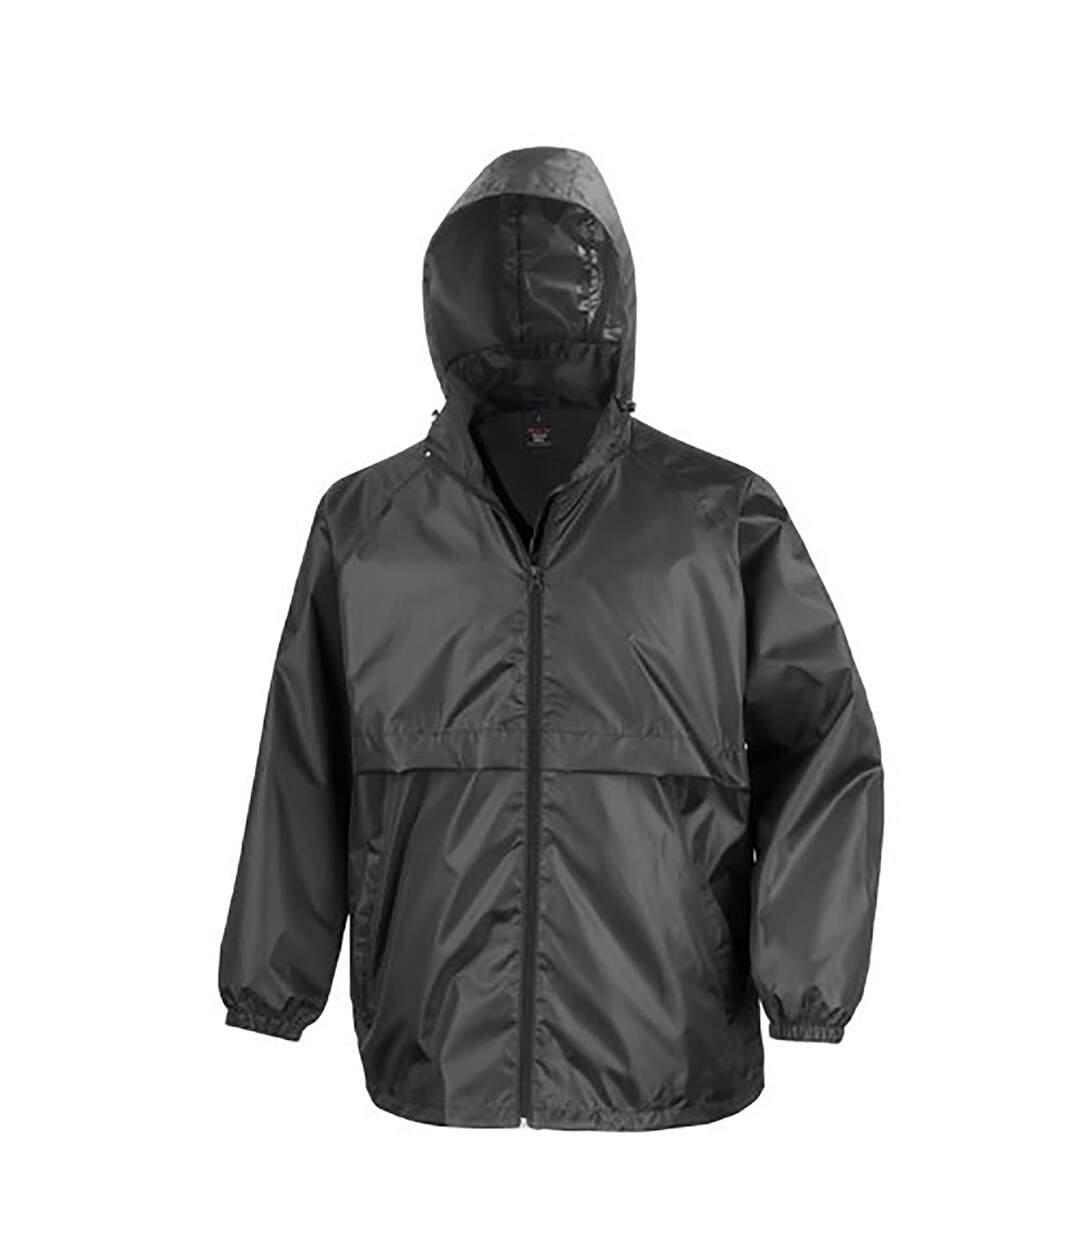 Result Mens Core Adult Windcheater Water Repellent Windproof Jacket (Black) - UTBC897